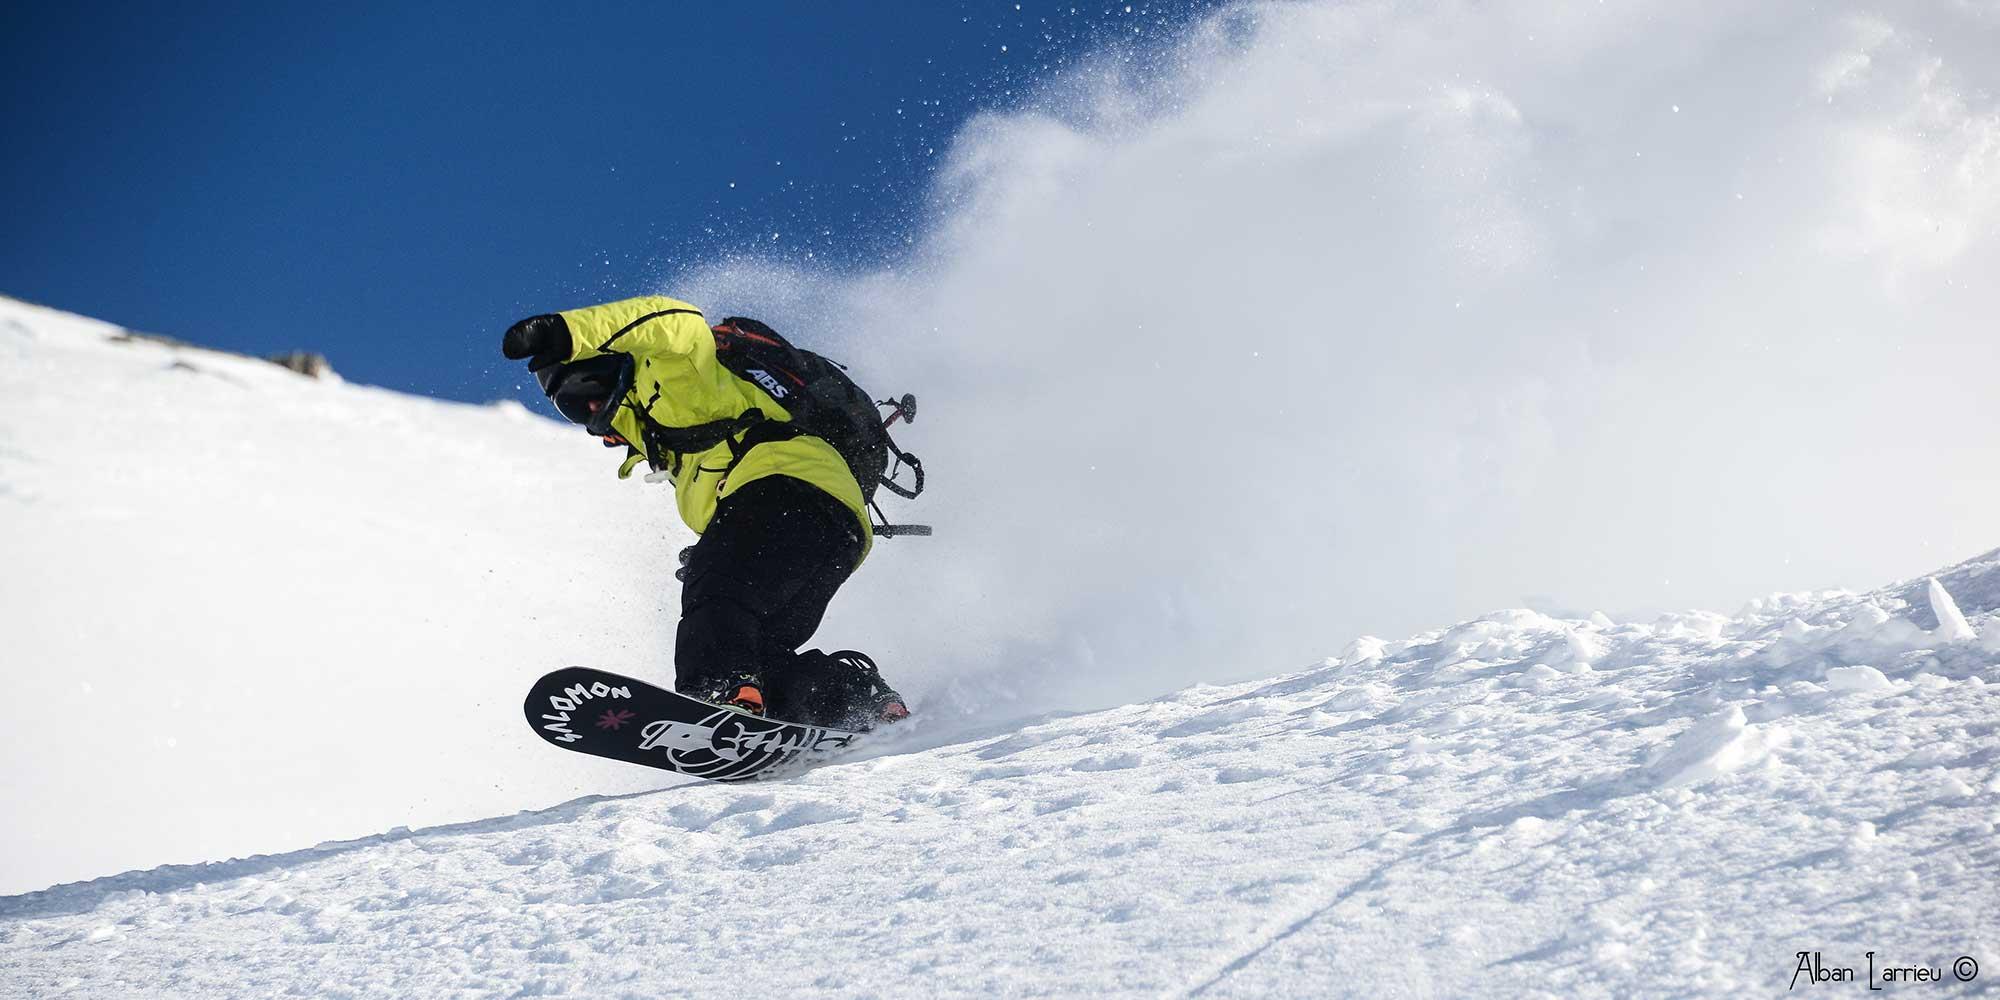 choisir ses chaussures de snowboard